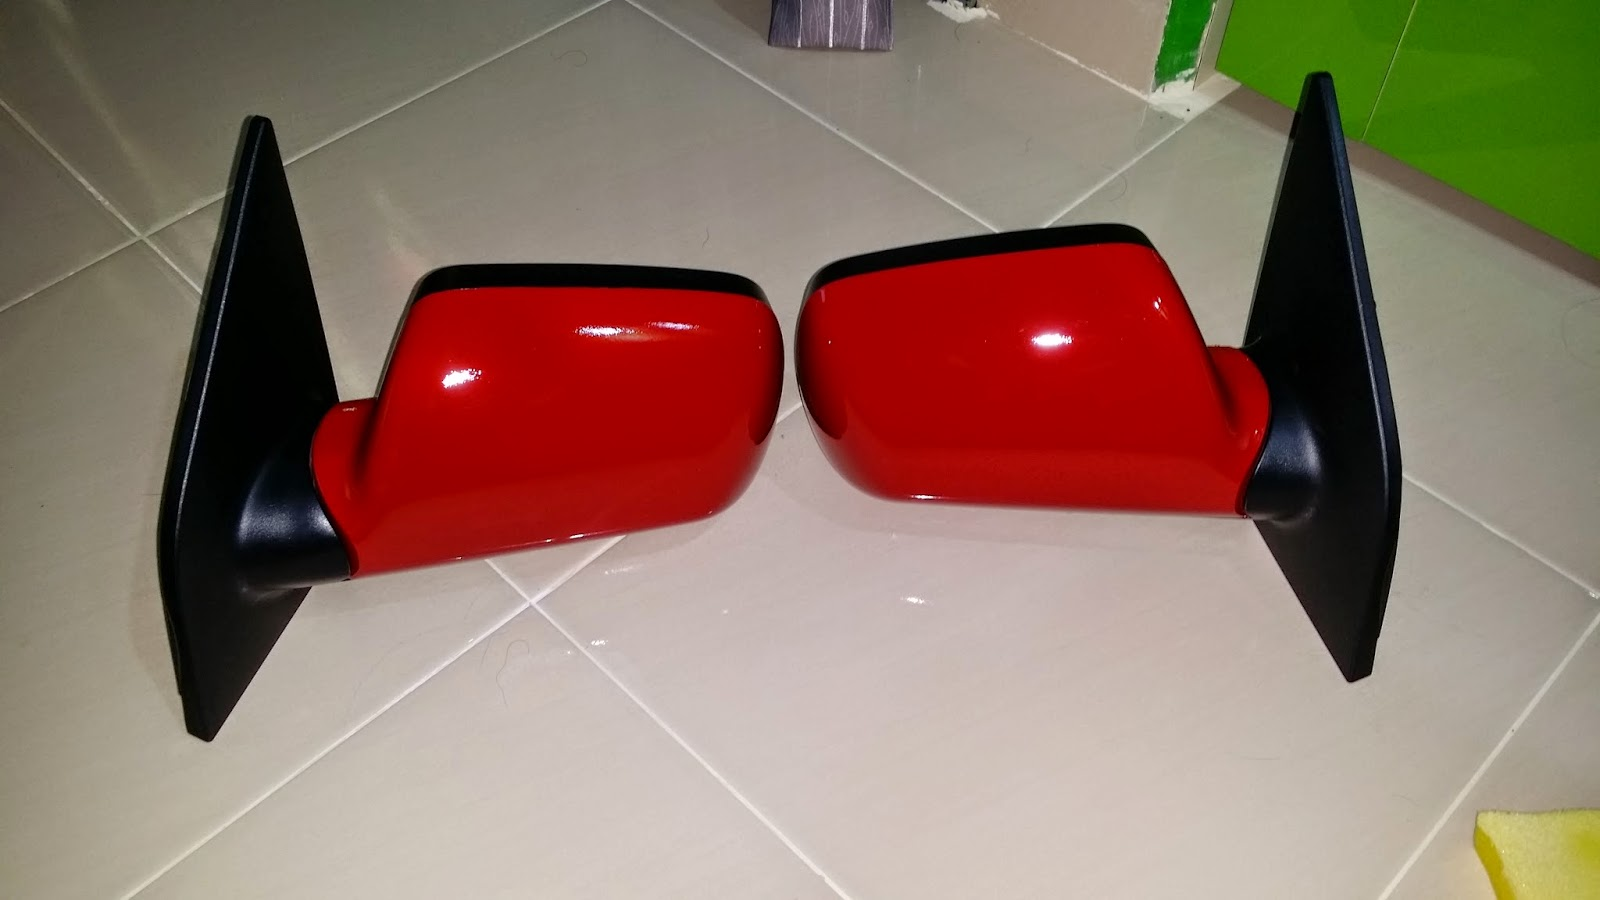 Kia Spectra Picanto Genuine Side Mirror Fr Sale Fuse Box Location